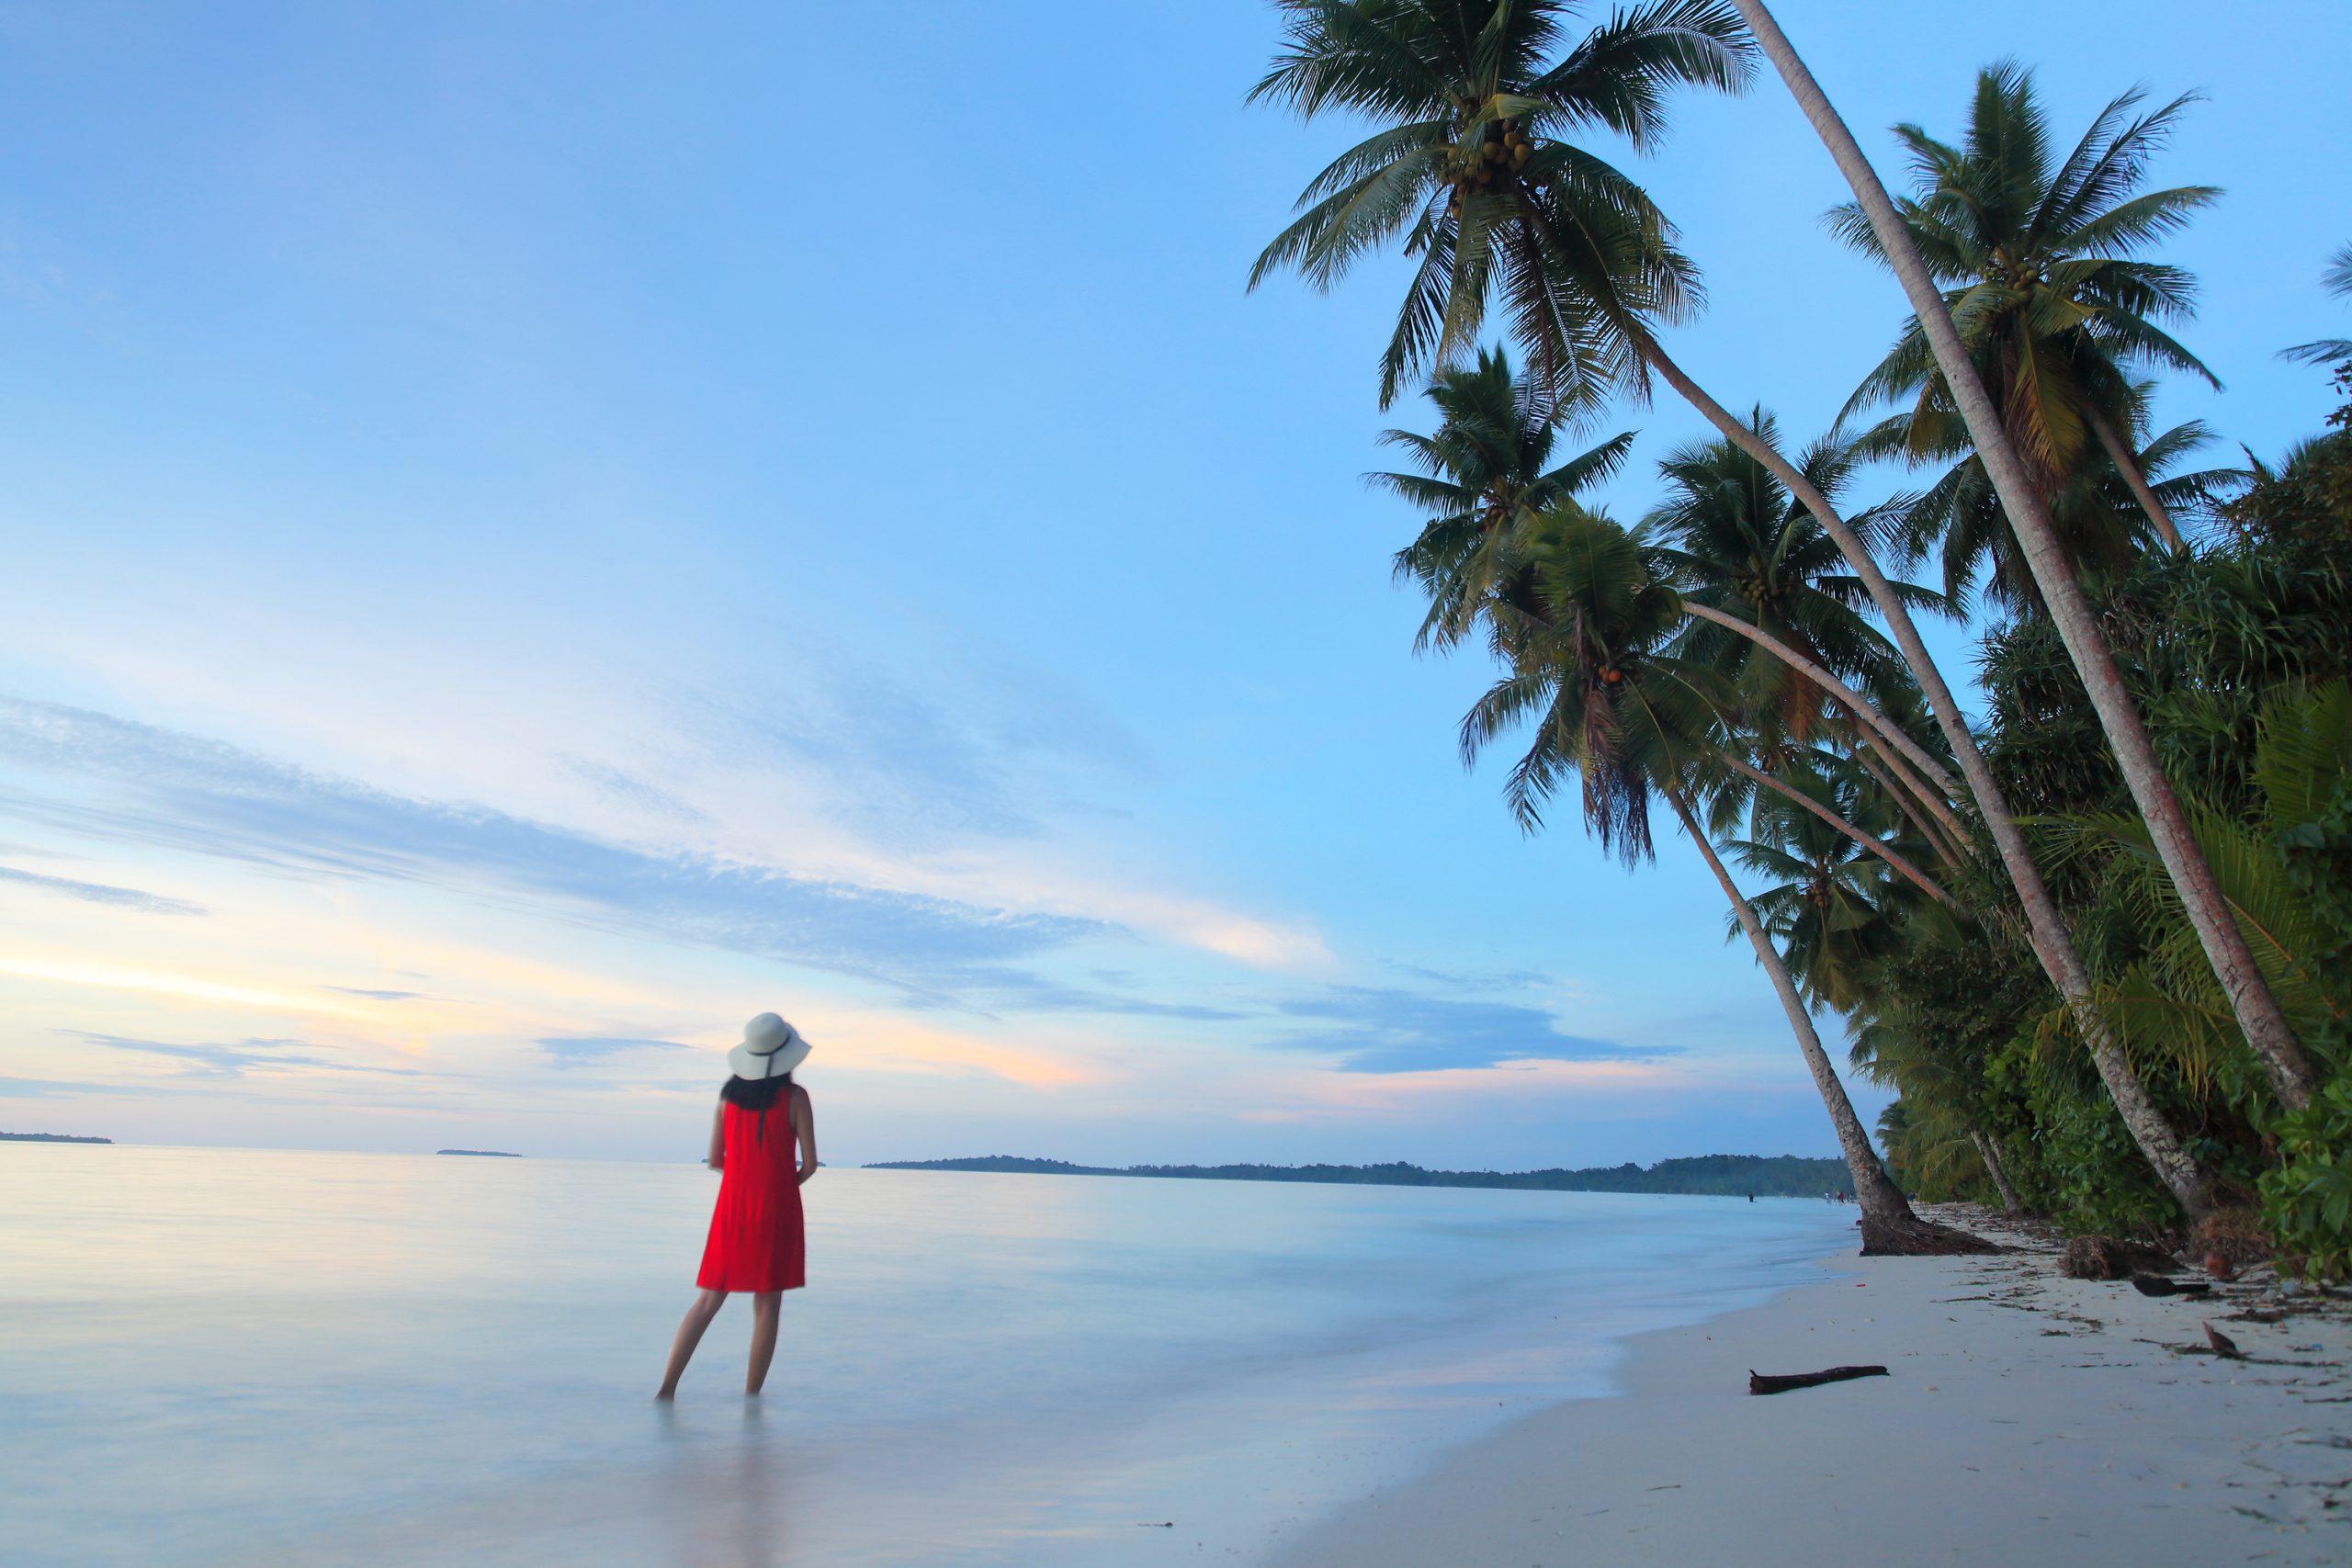 The beauty of Kei islands